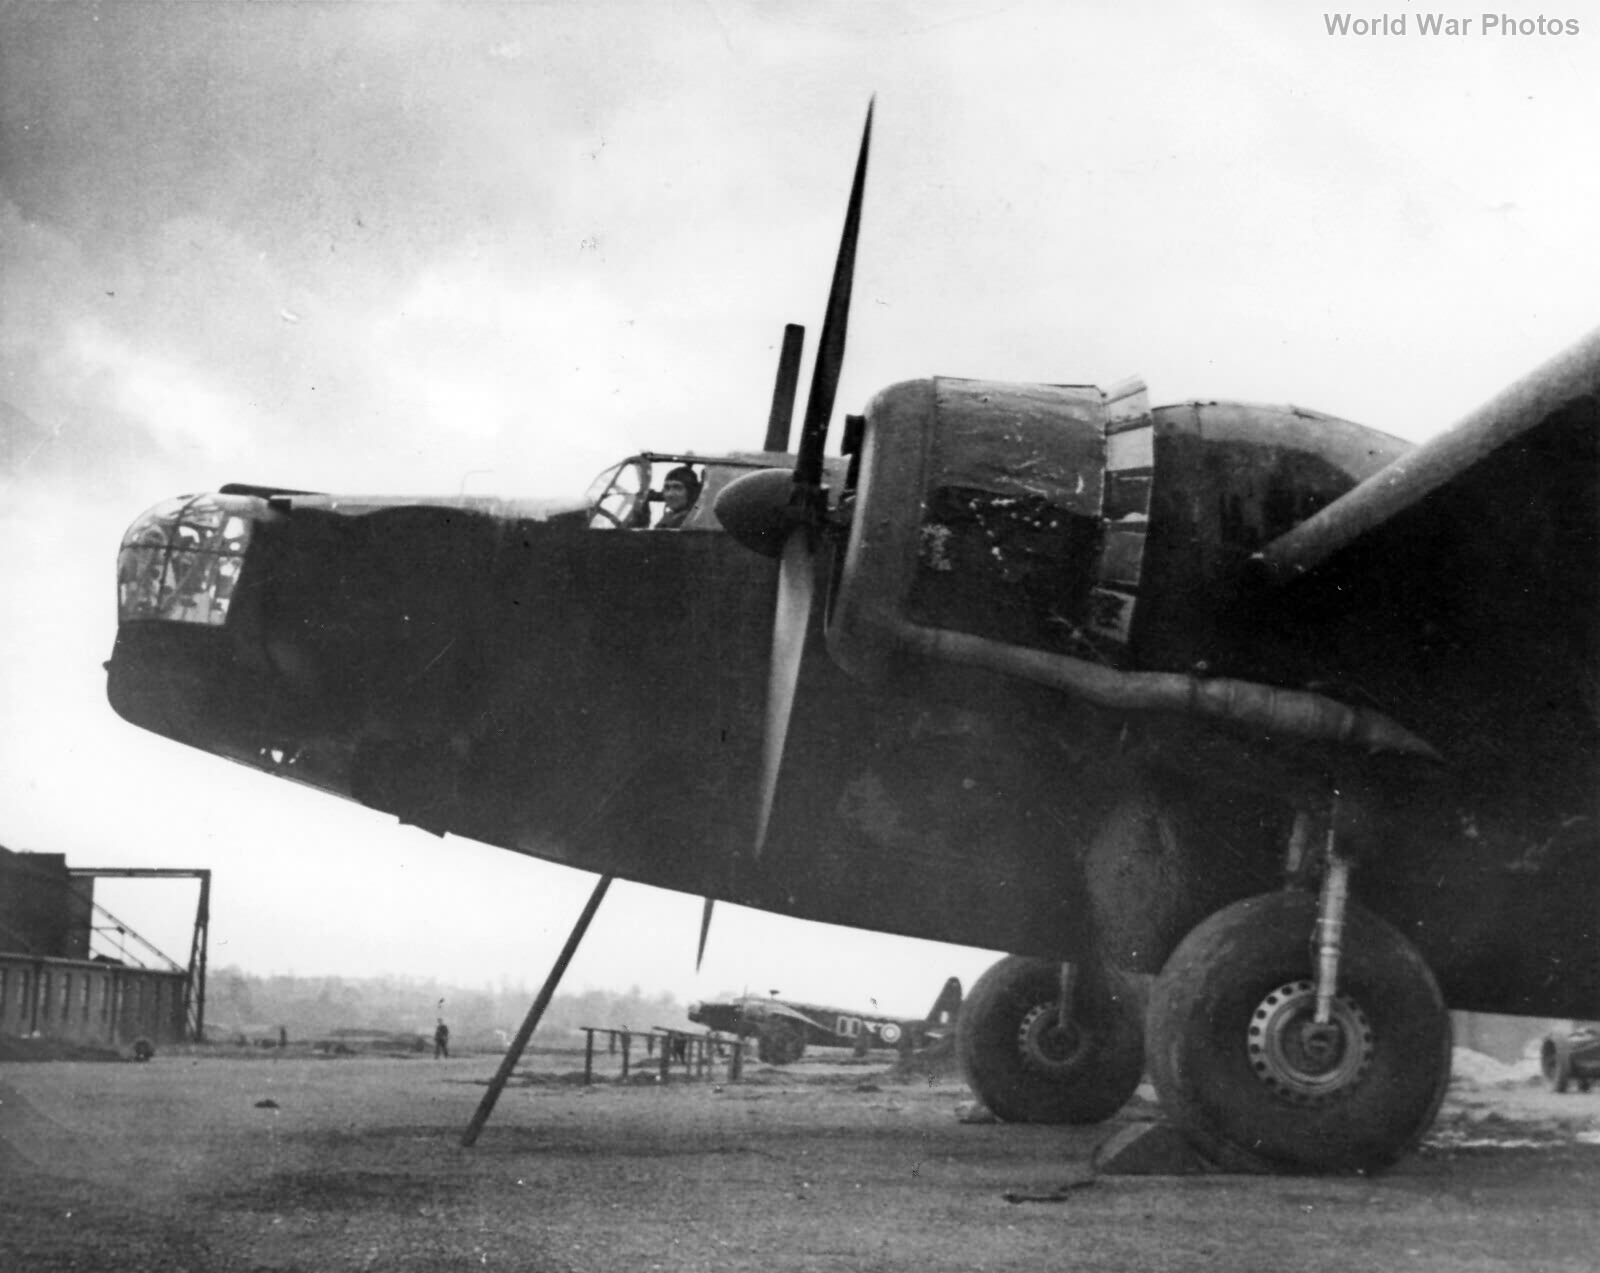 Wellington at Wellesbourne Mountford Airfield